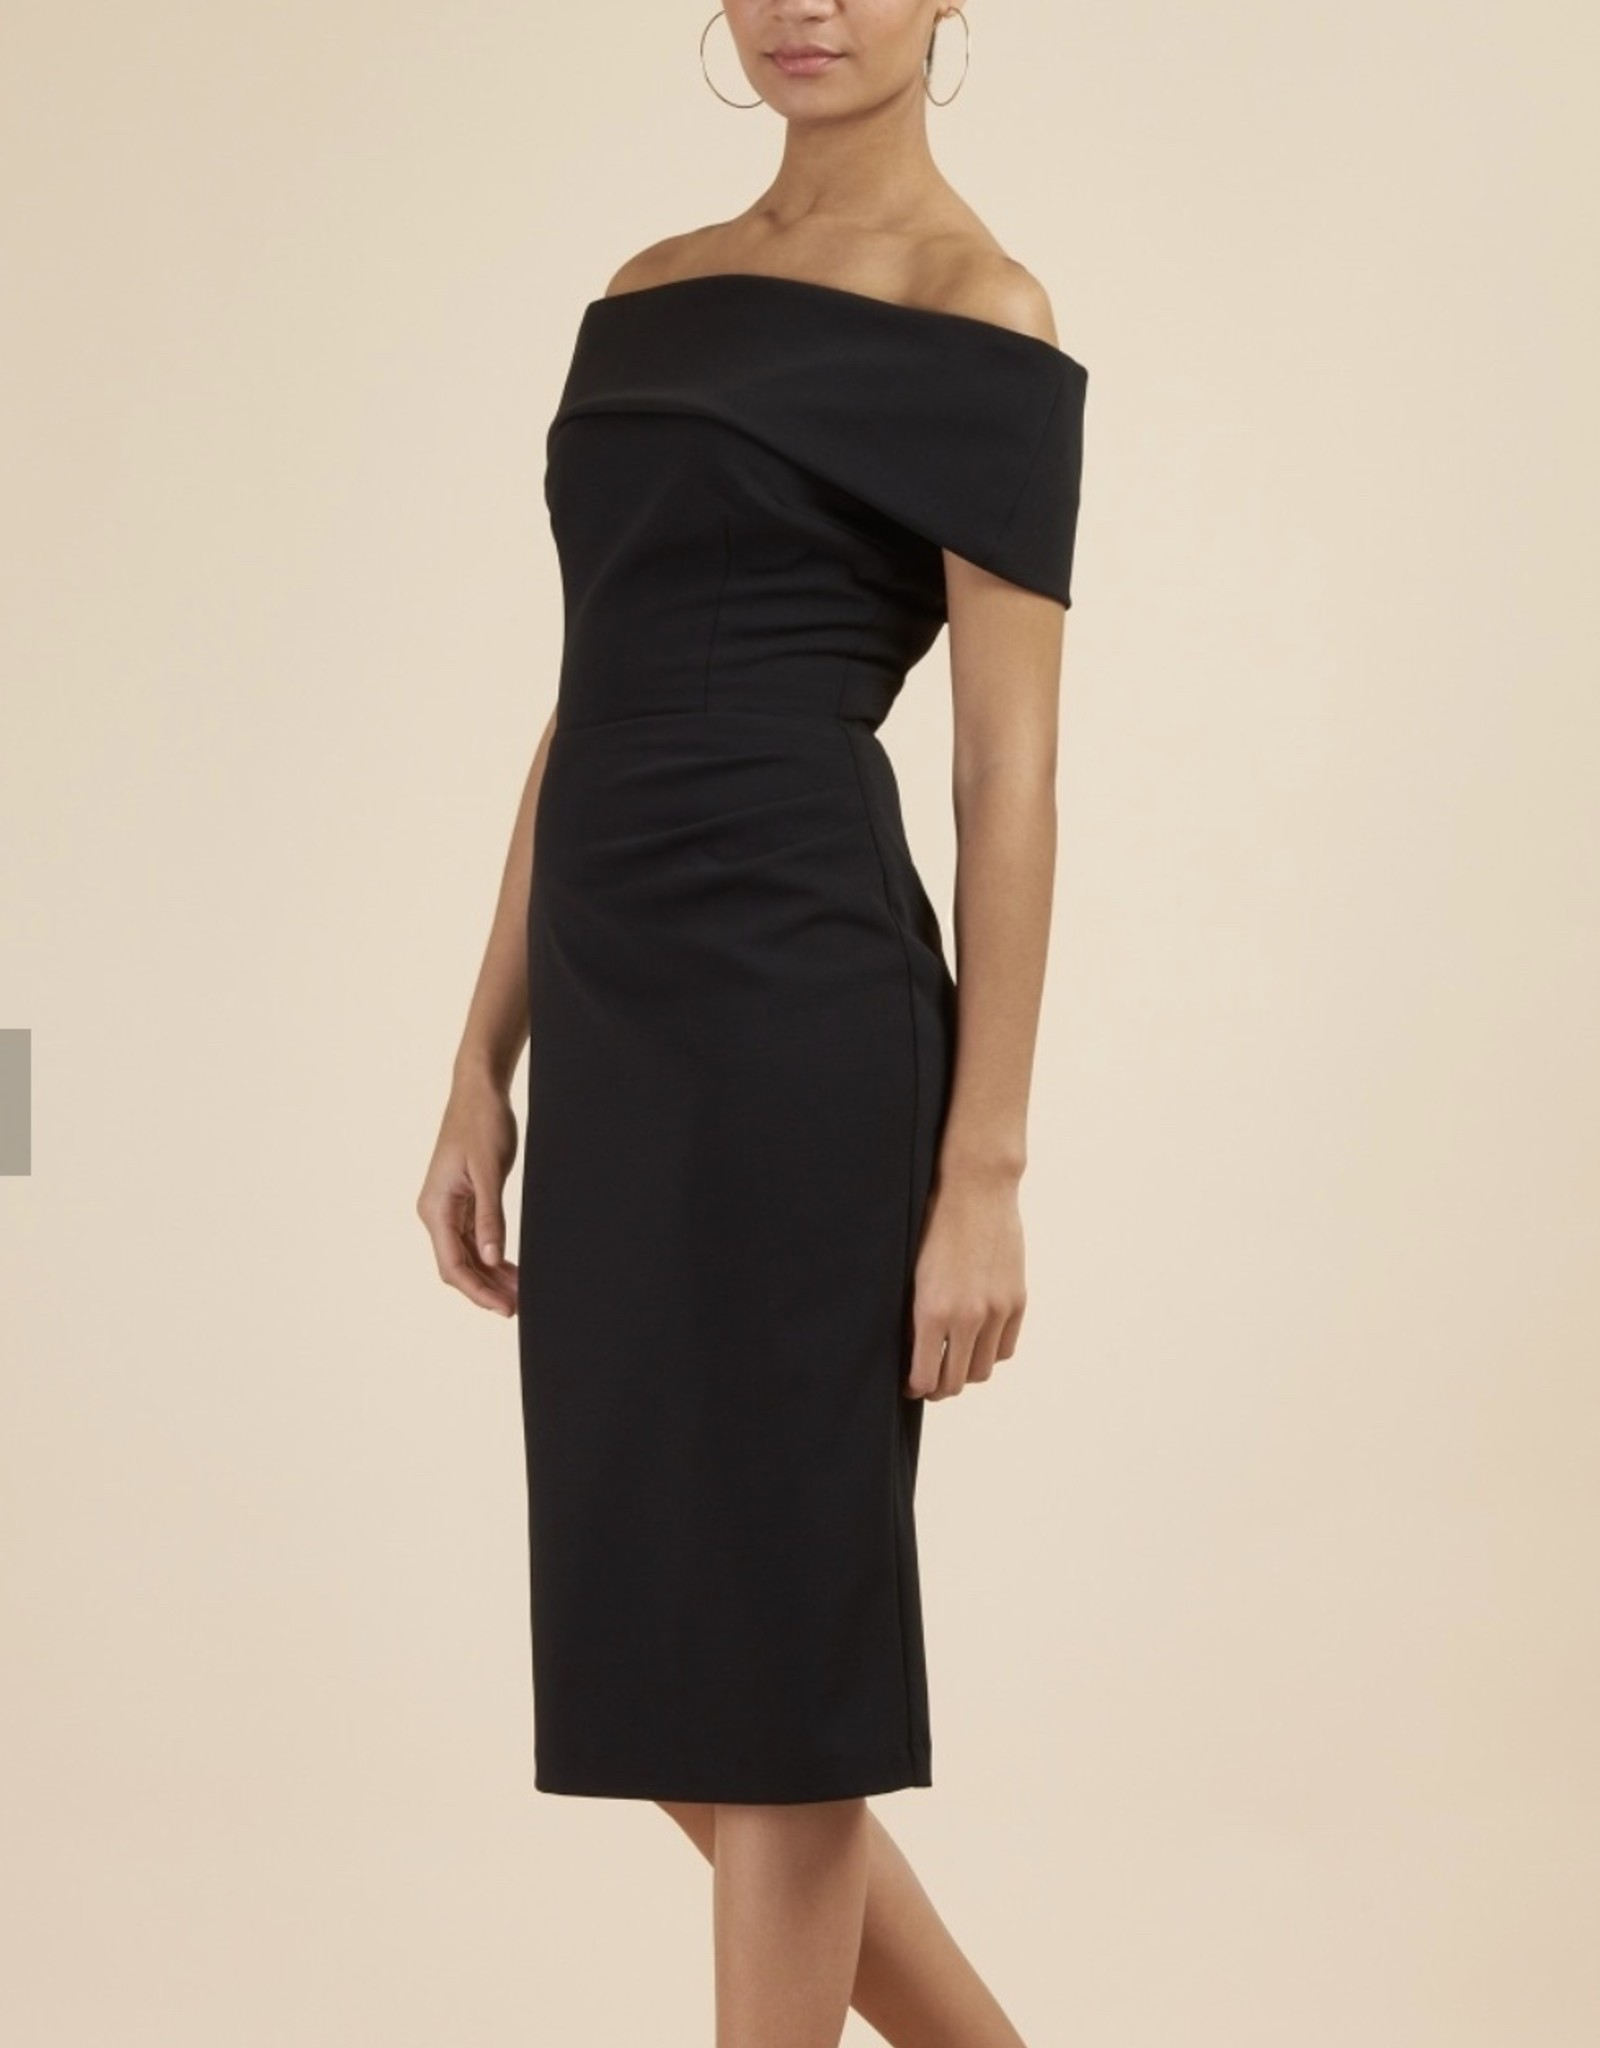 PRETTY DRESS COMPANY DANI  BARDOT DRESS by PDC